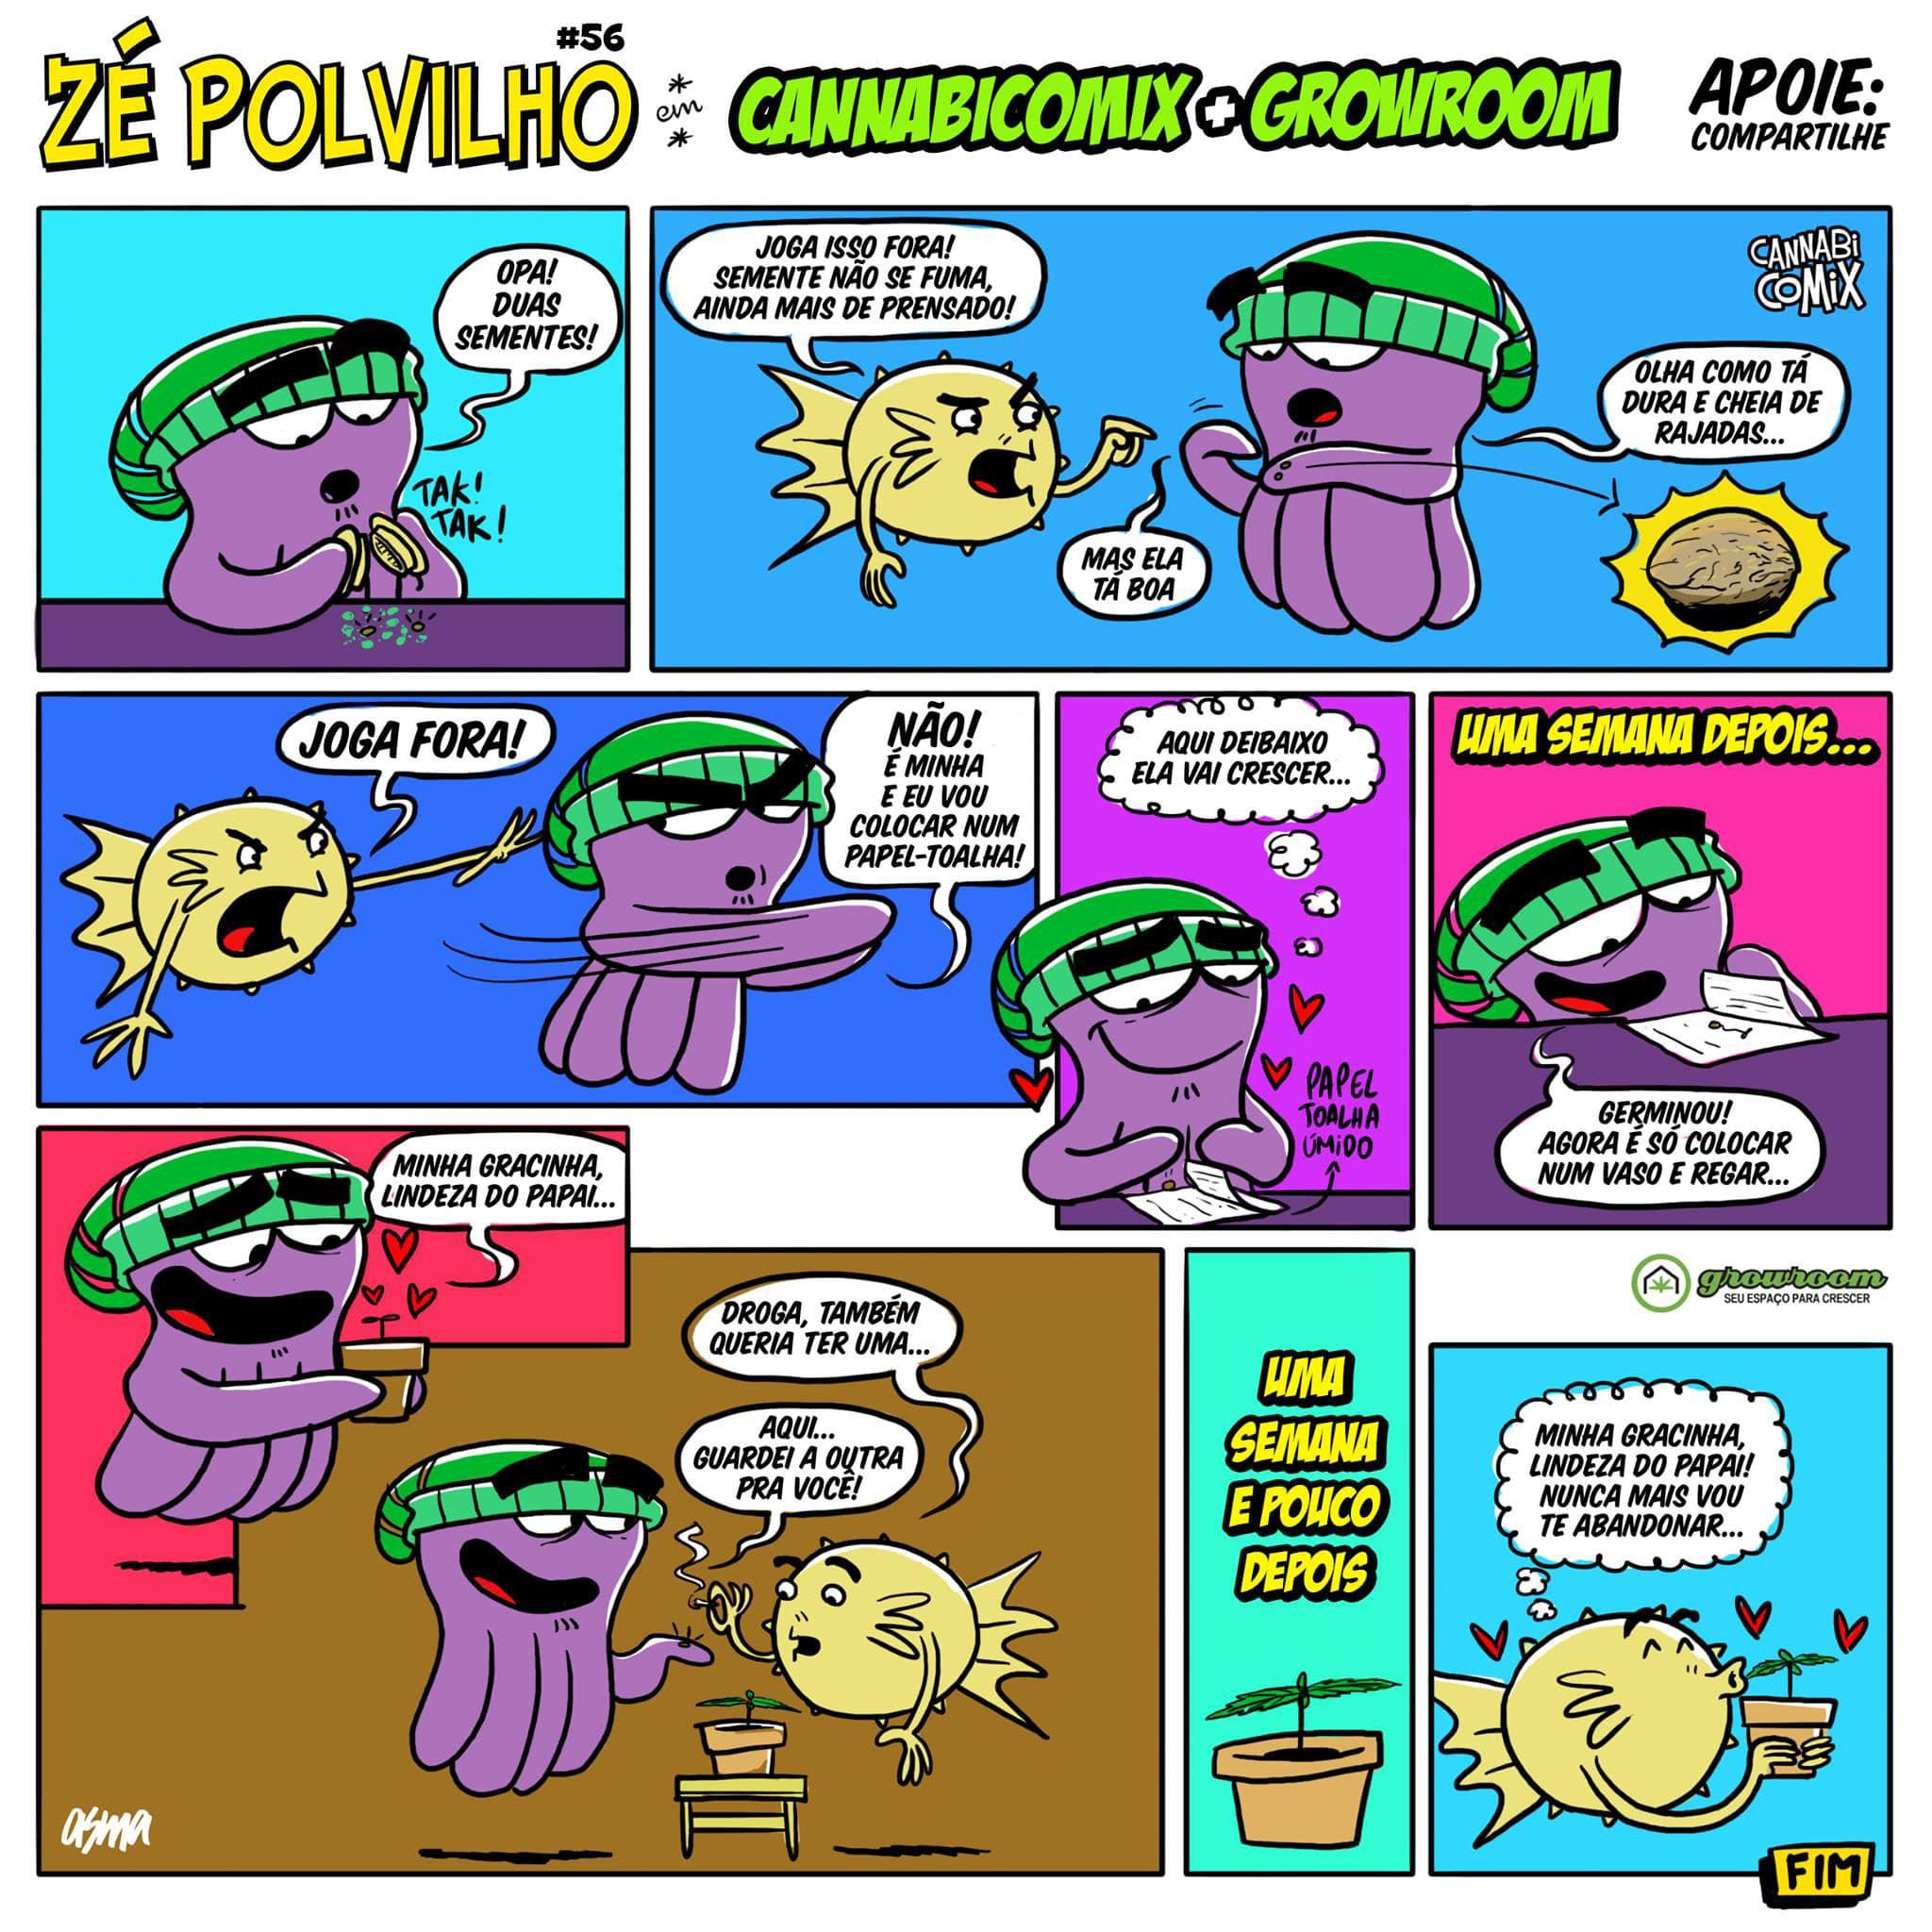 Zé polvilho do Cannabicomix